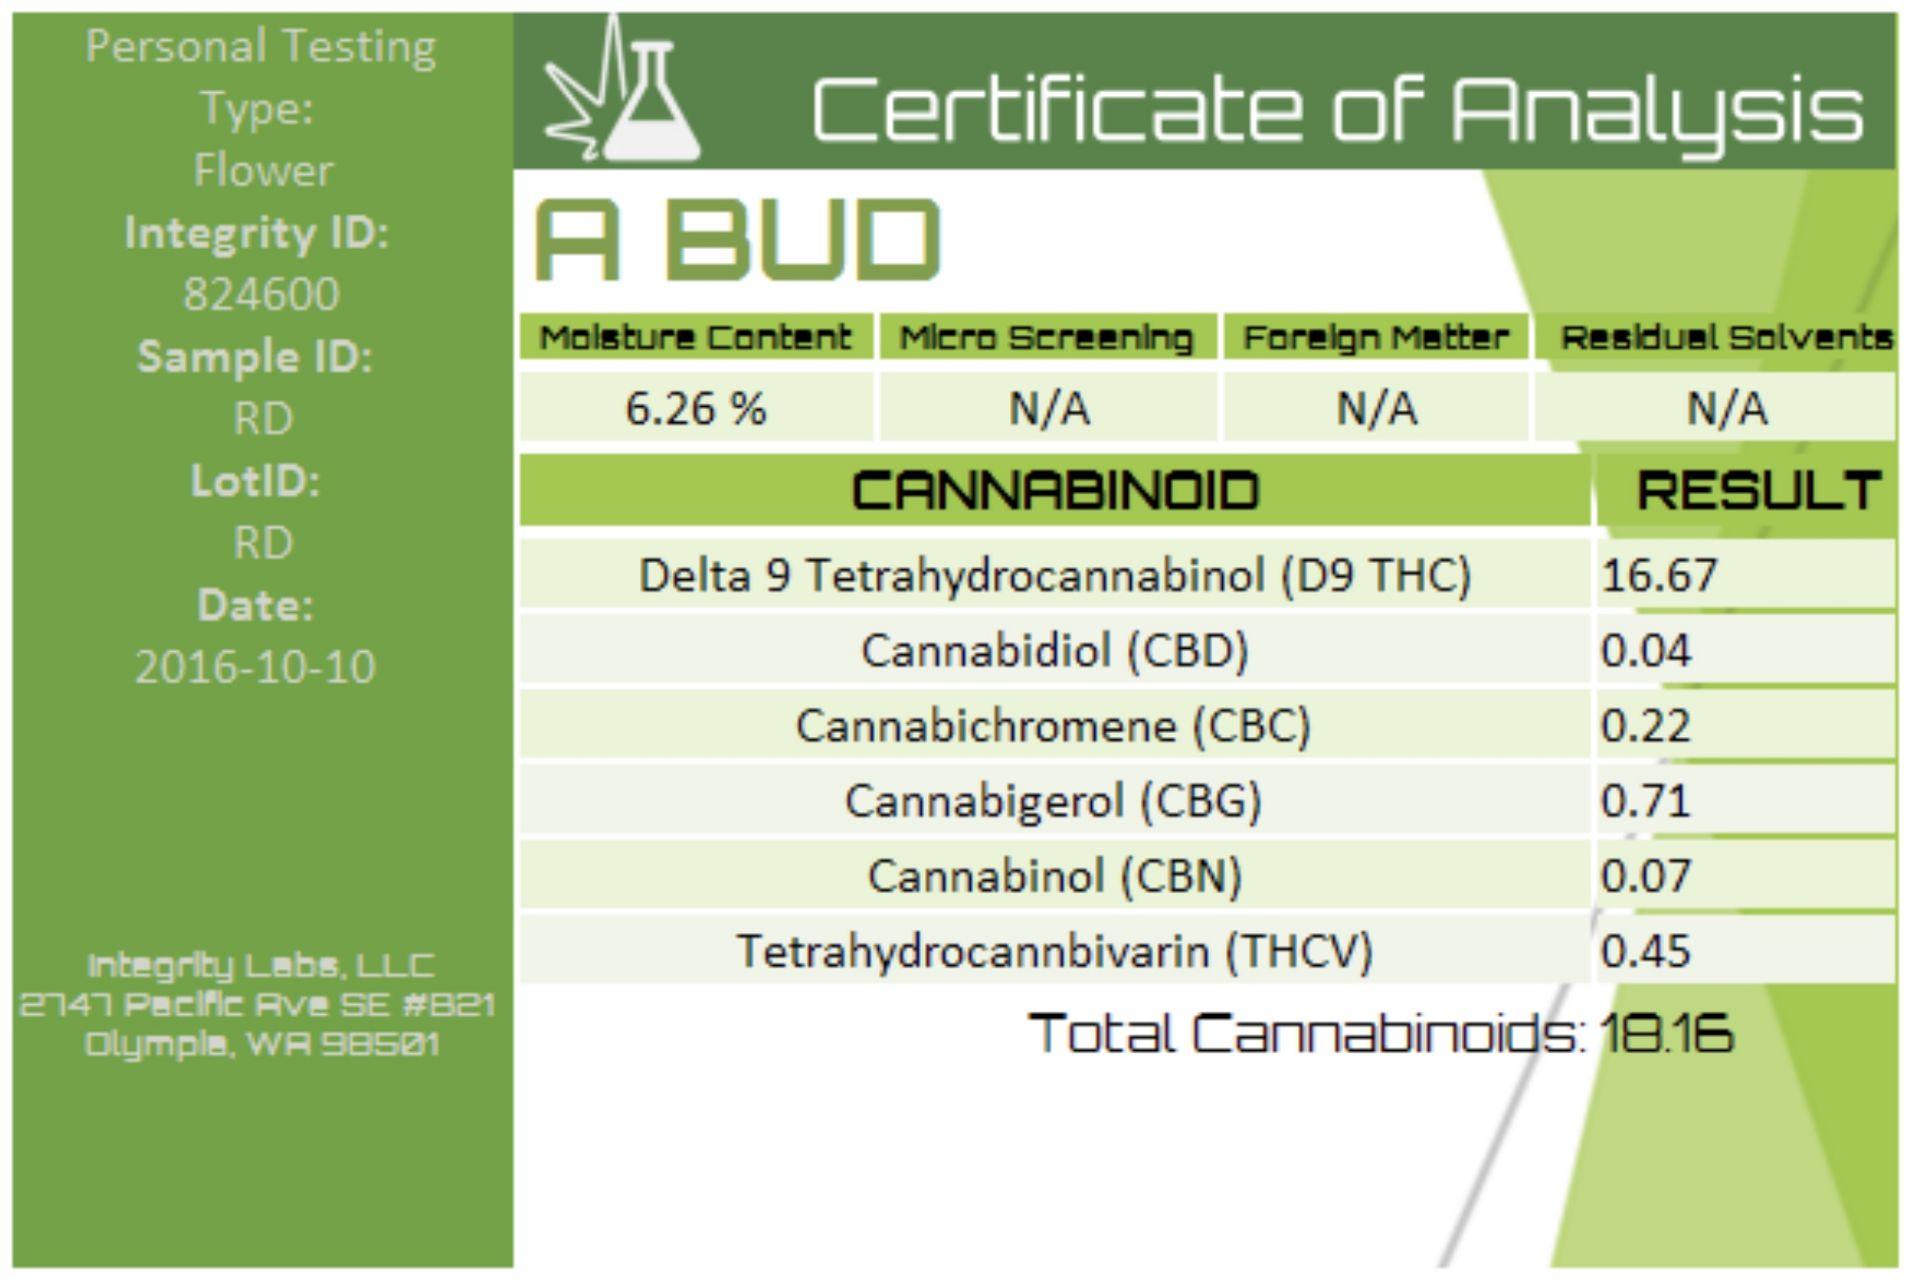 Unused/FactoryNew Revolution Cannabis & Hemp Flower Finisher System Model RDF 4300.100-200 lbs/8 hrs - Image 29 of 32